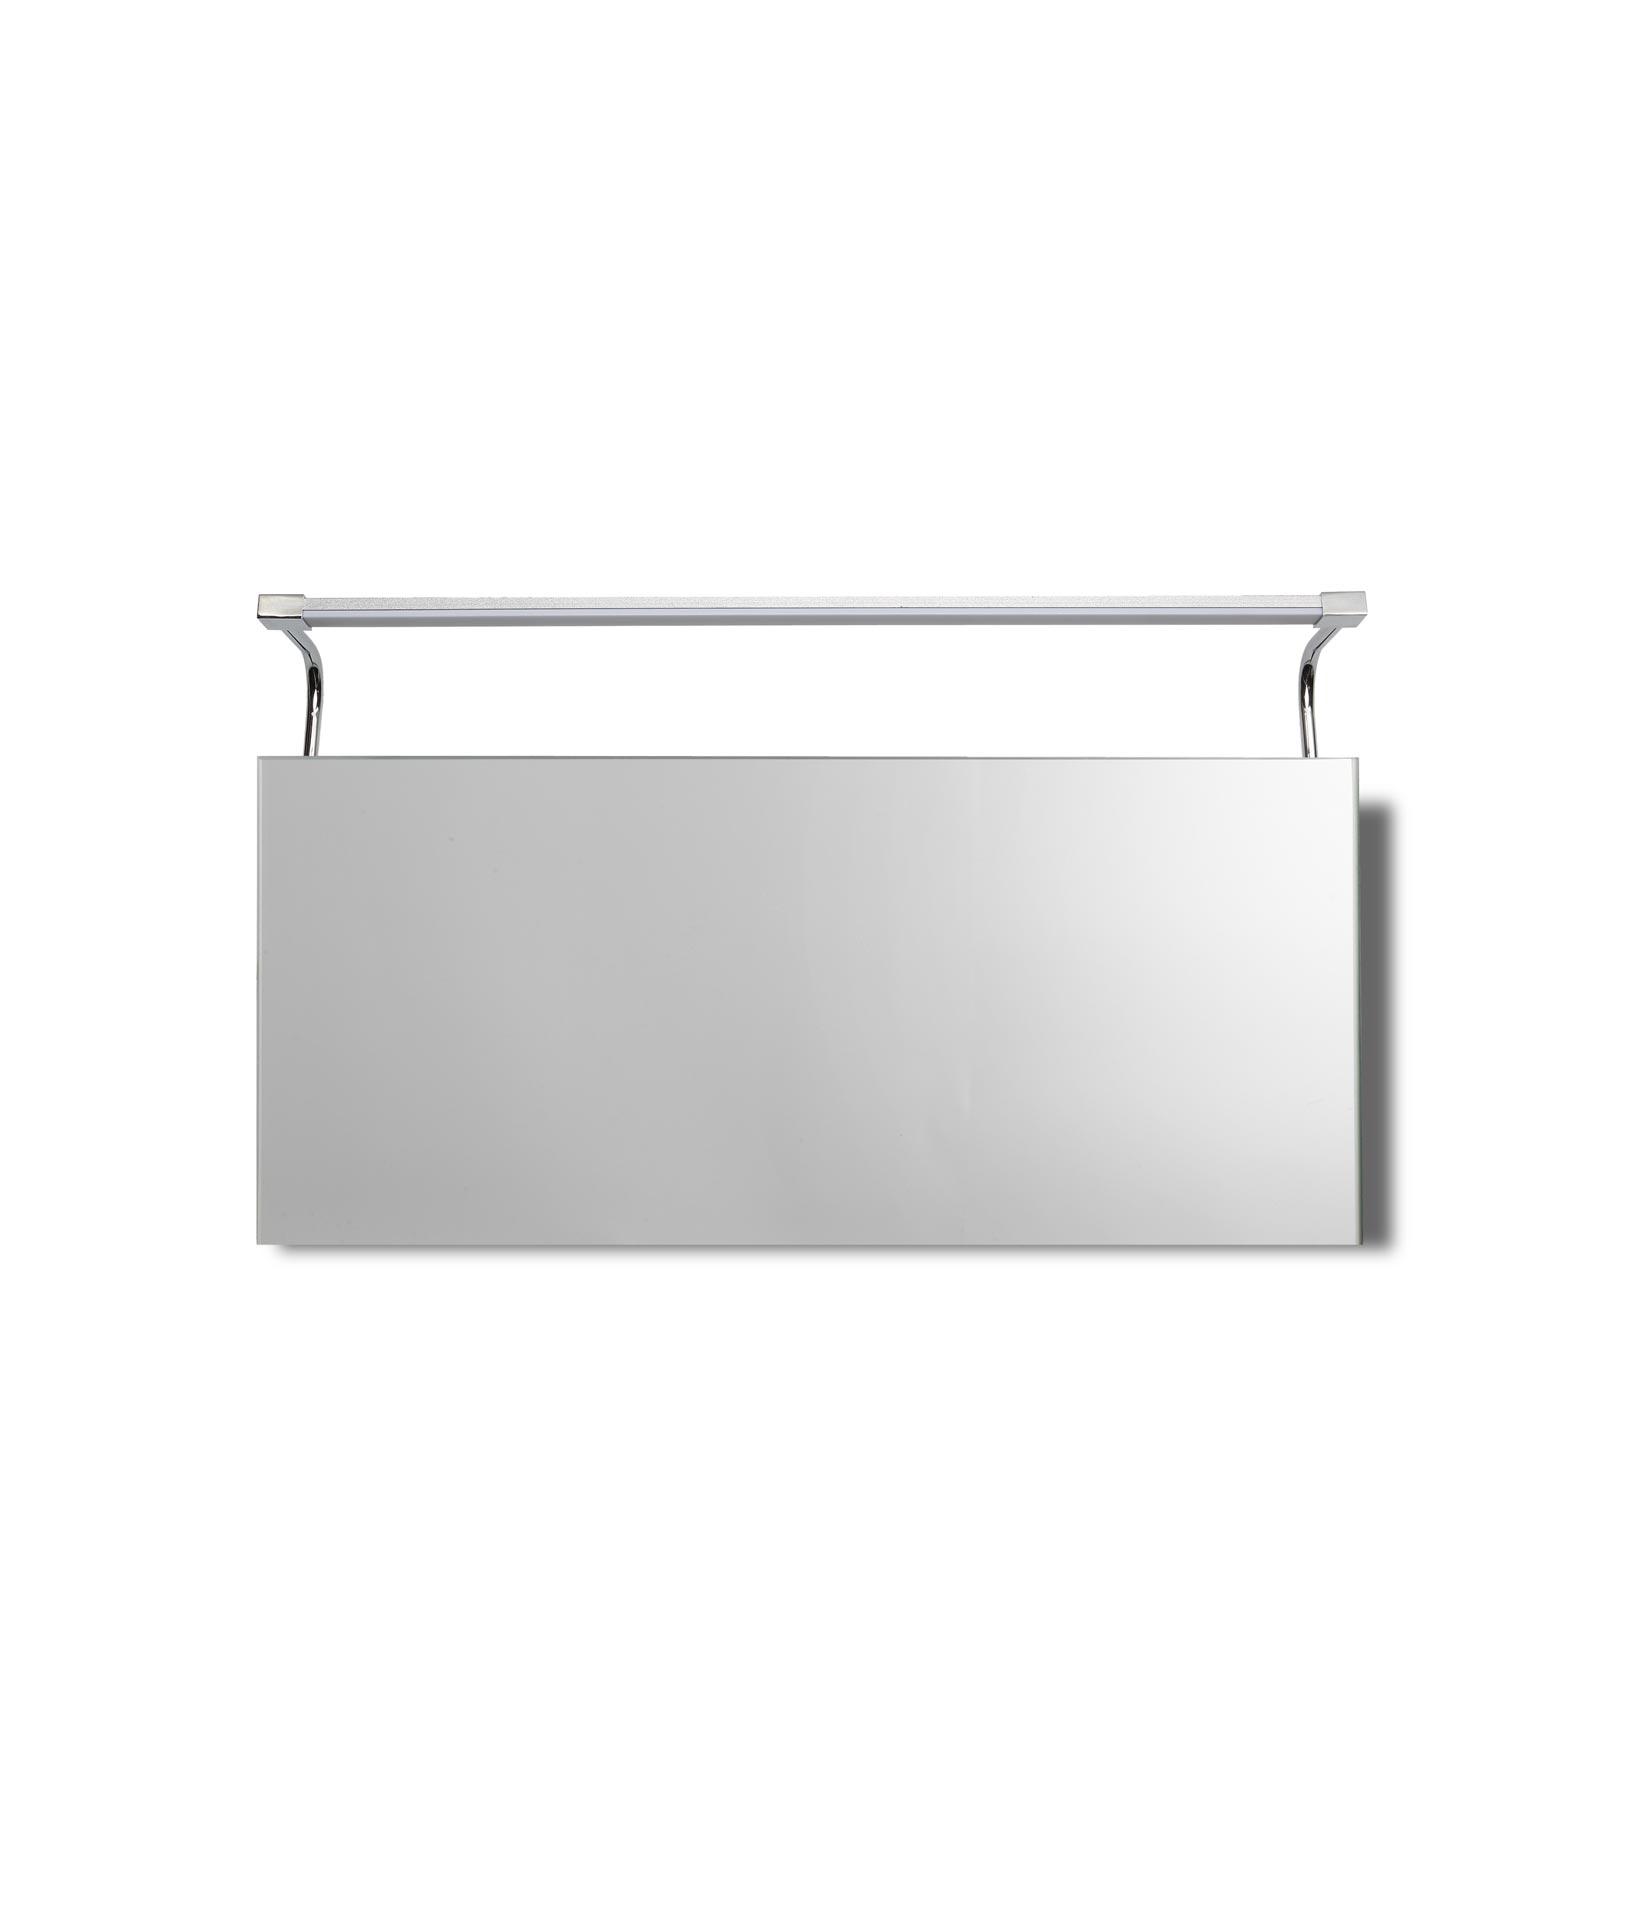 Aplique baño grande SISLEY plata cromo